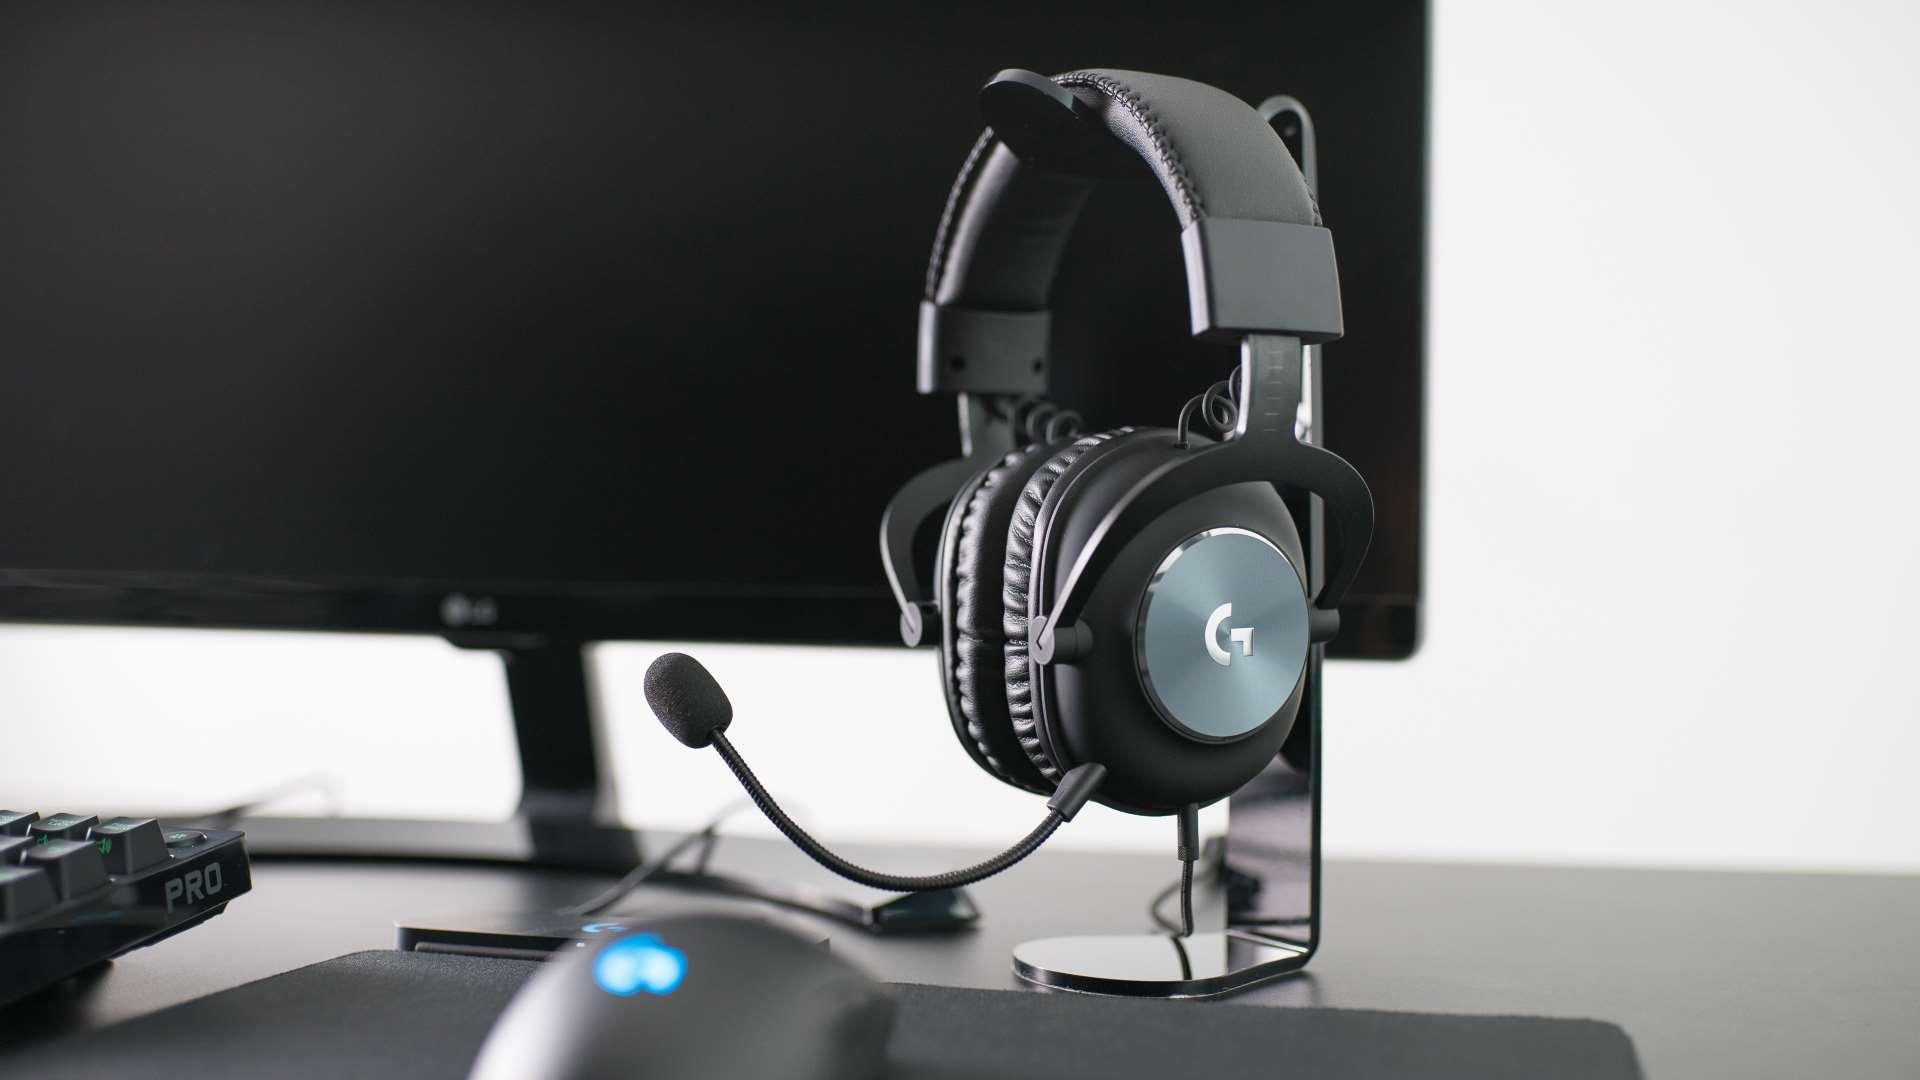 Logitech G Pro X gaming headset review: smart mic tech for ...